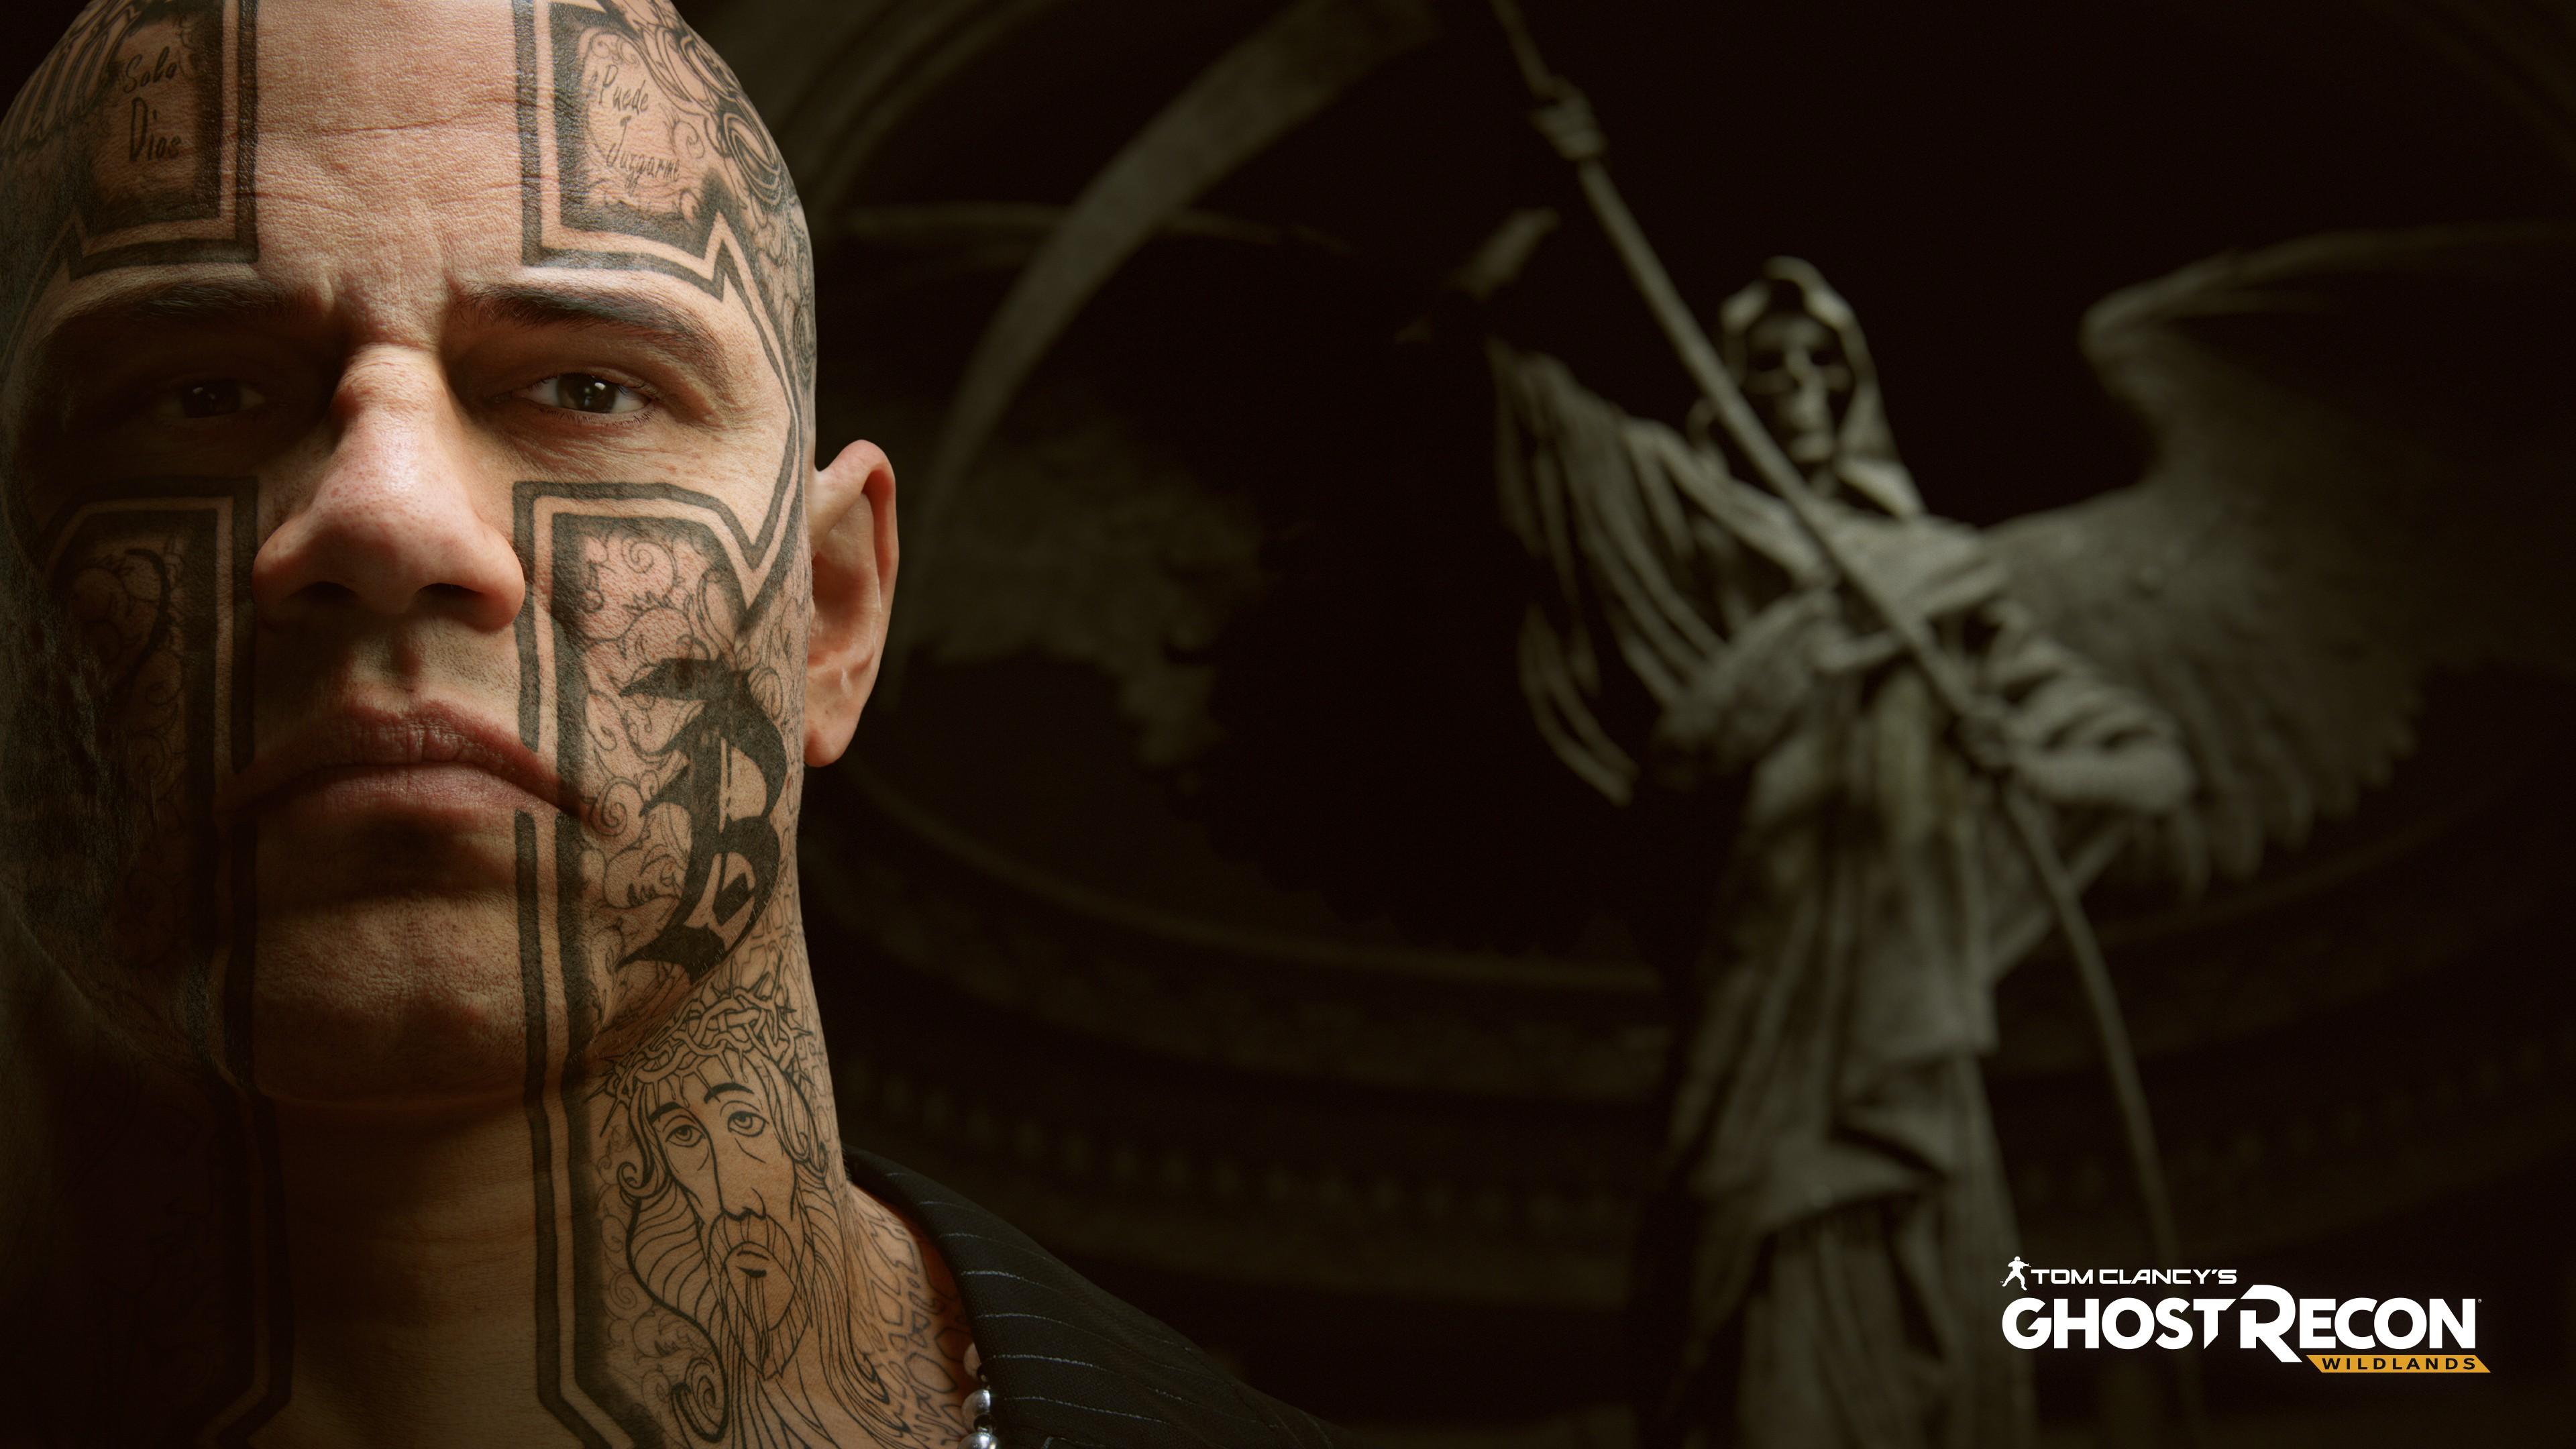 Tom Clancys Ghost Recon Wildlands 4k Hd Hd Games 4k Wallpapers